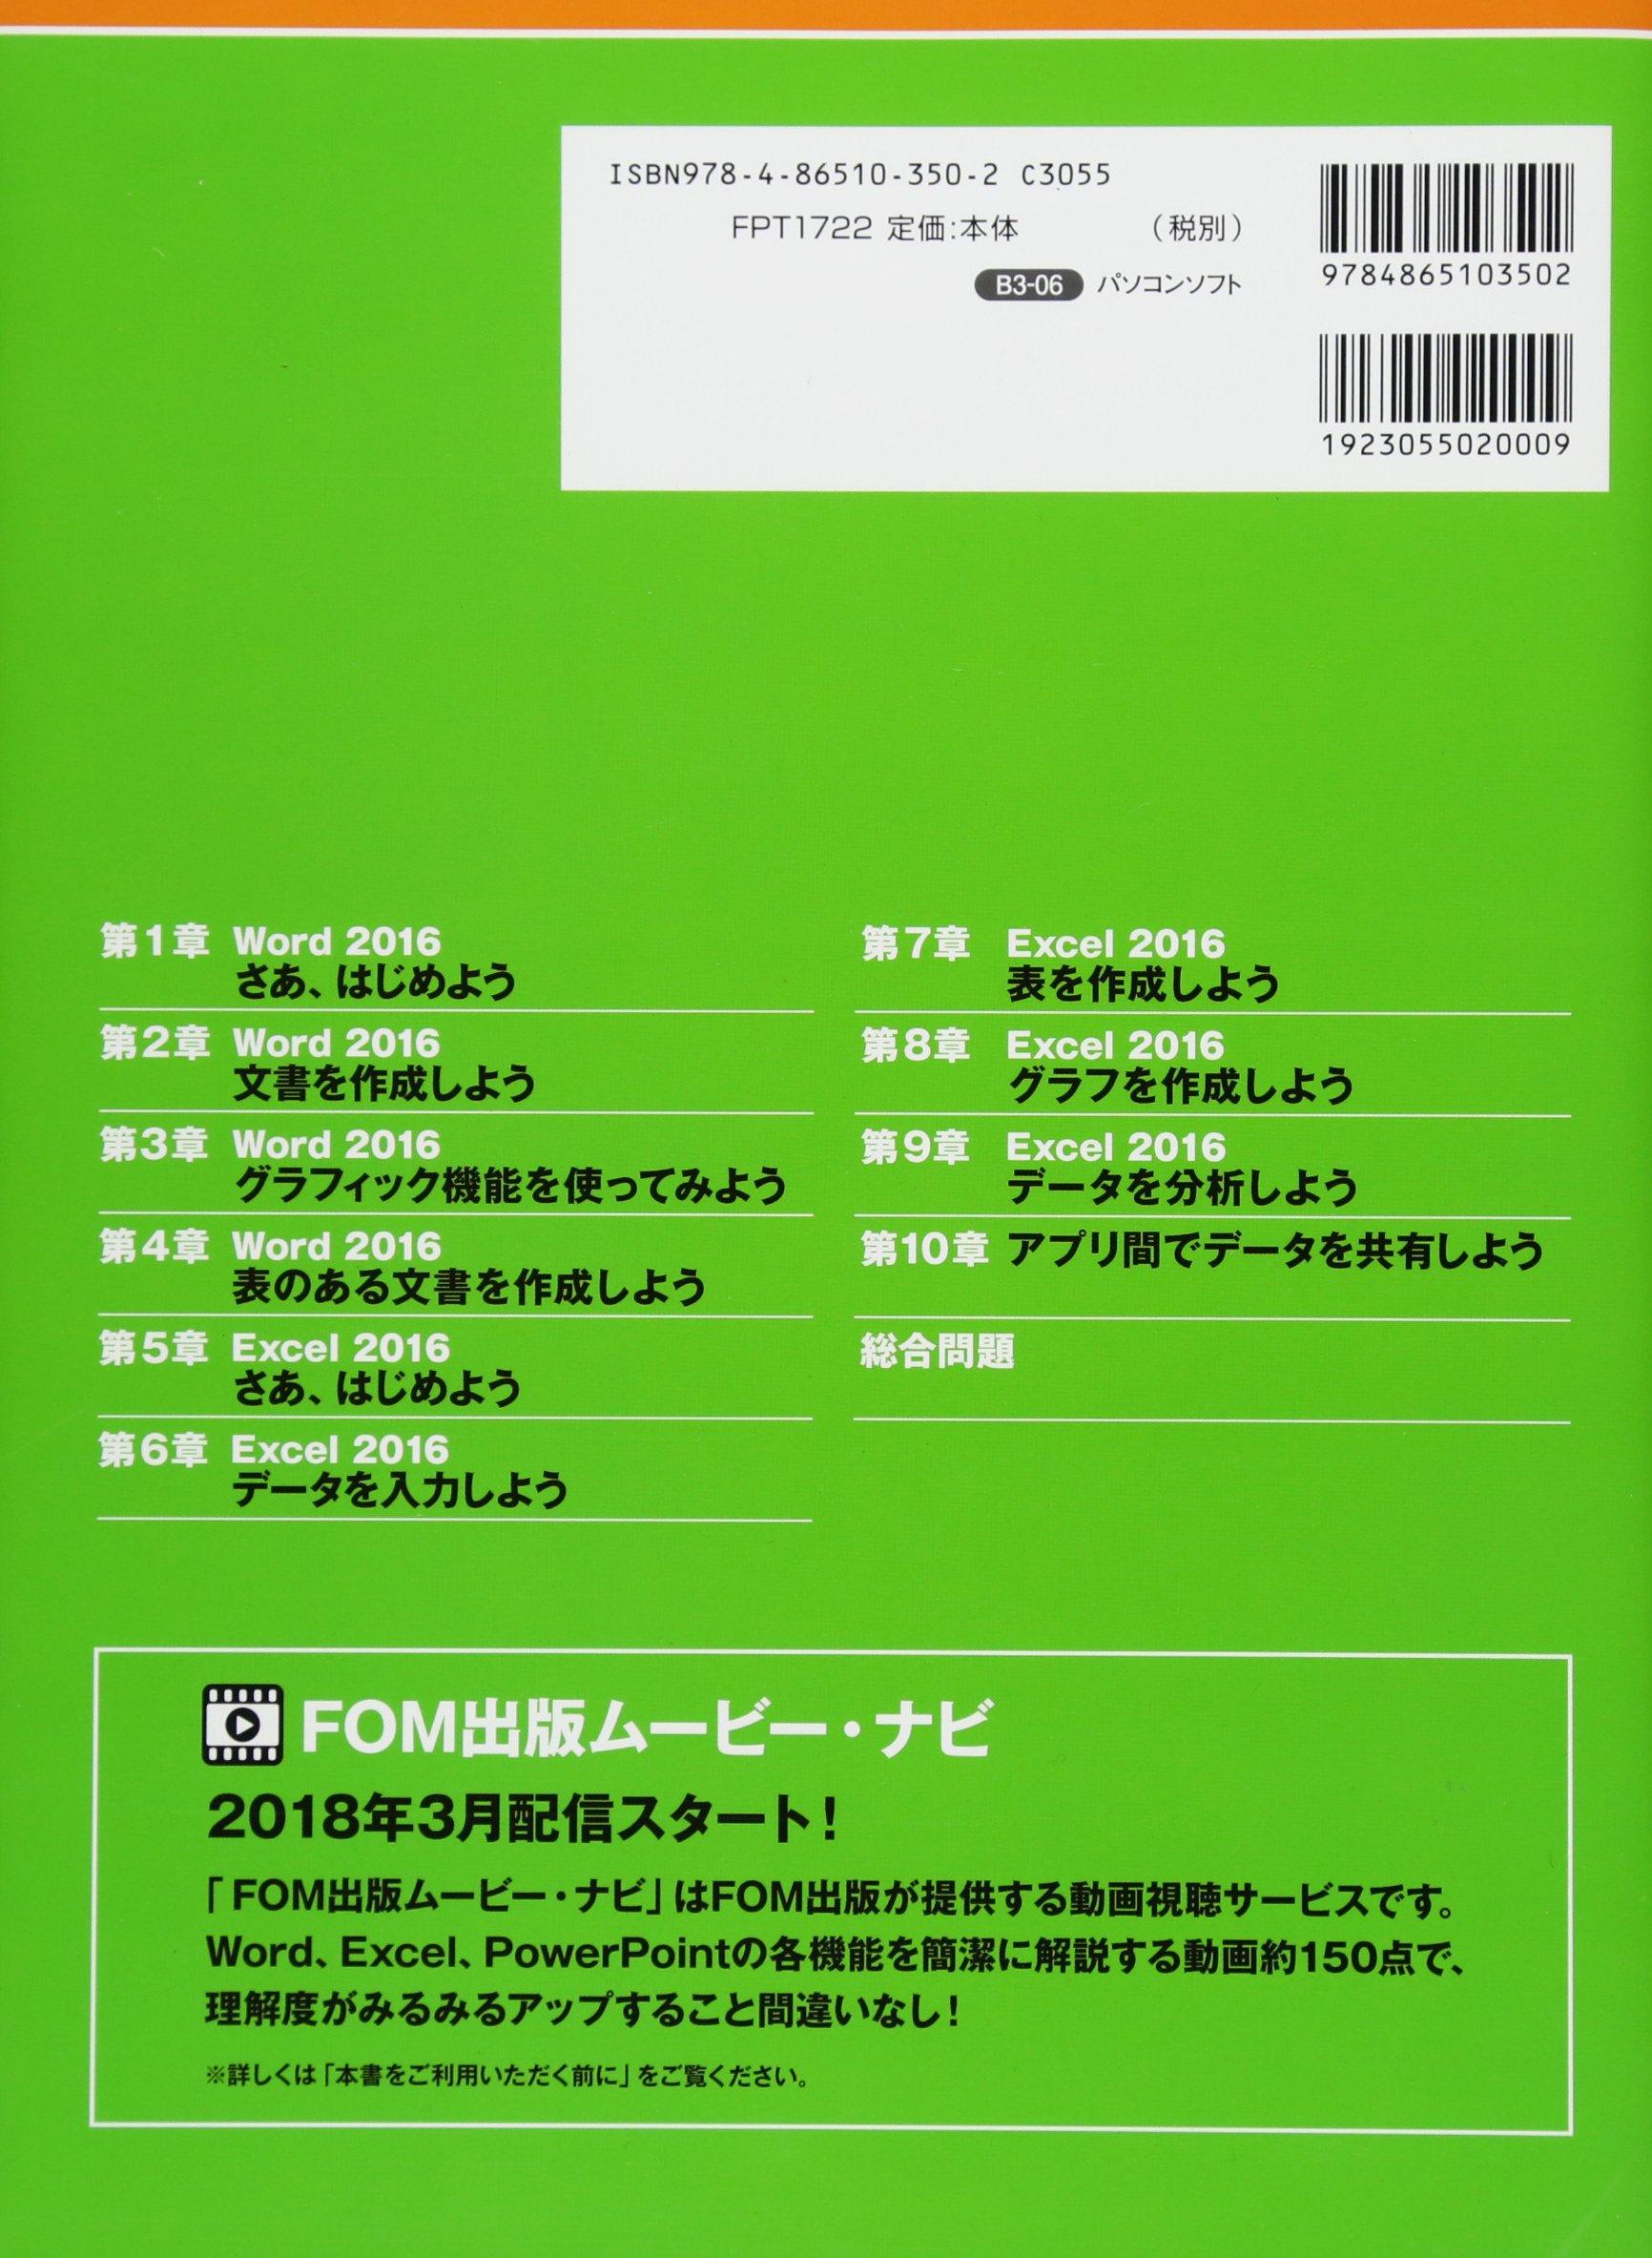 microsoft word 2016 microsoft excel 2016 改訂版 よくわかる